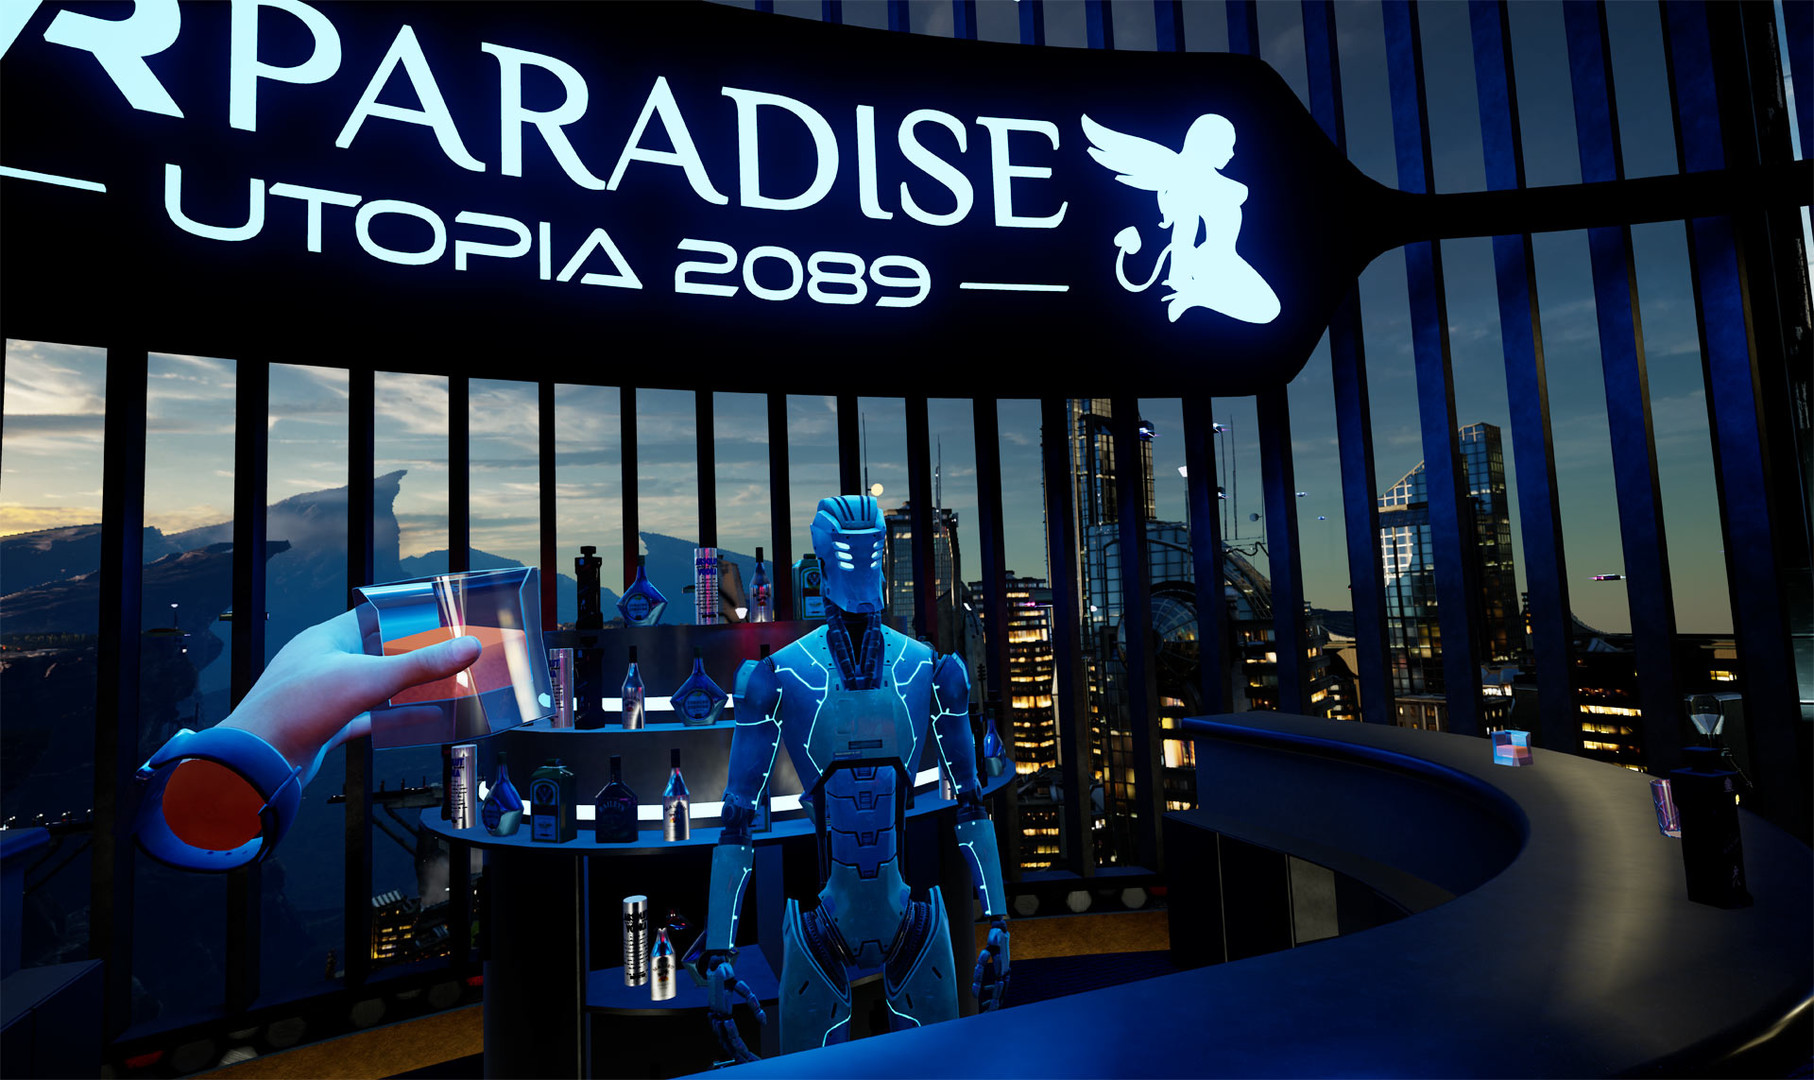 VR Paradise robot